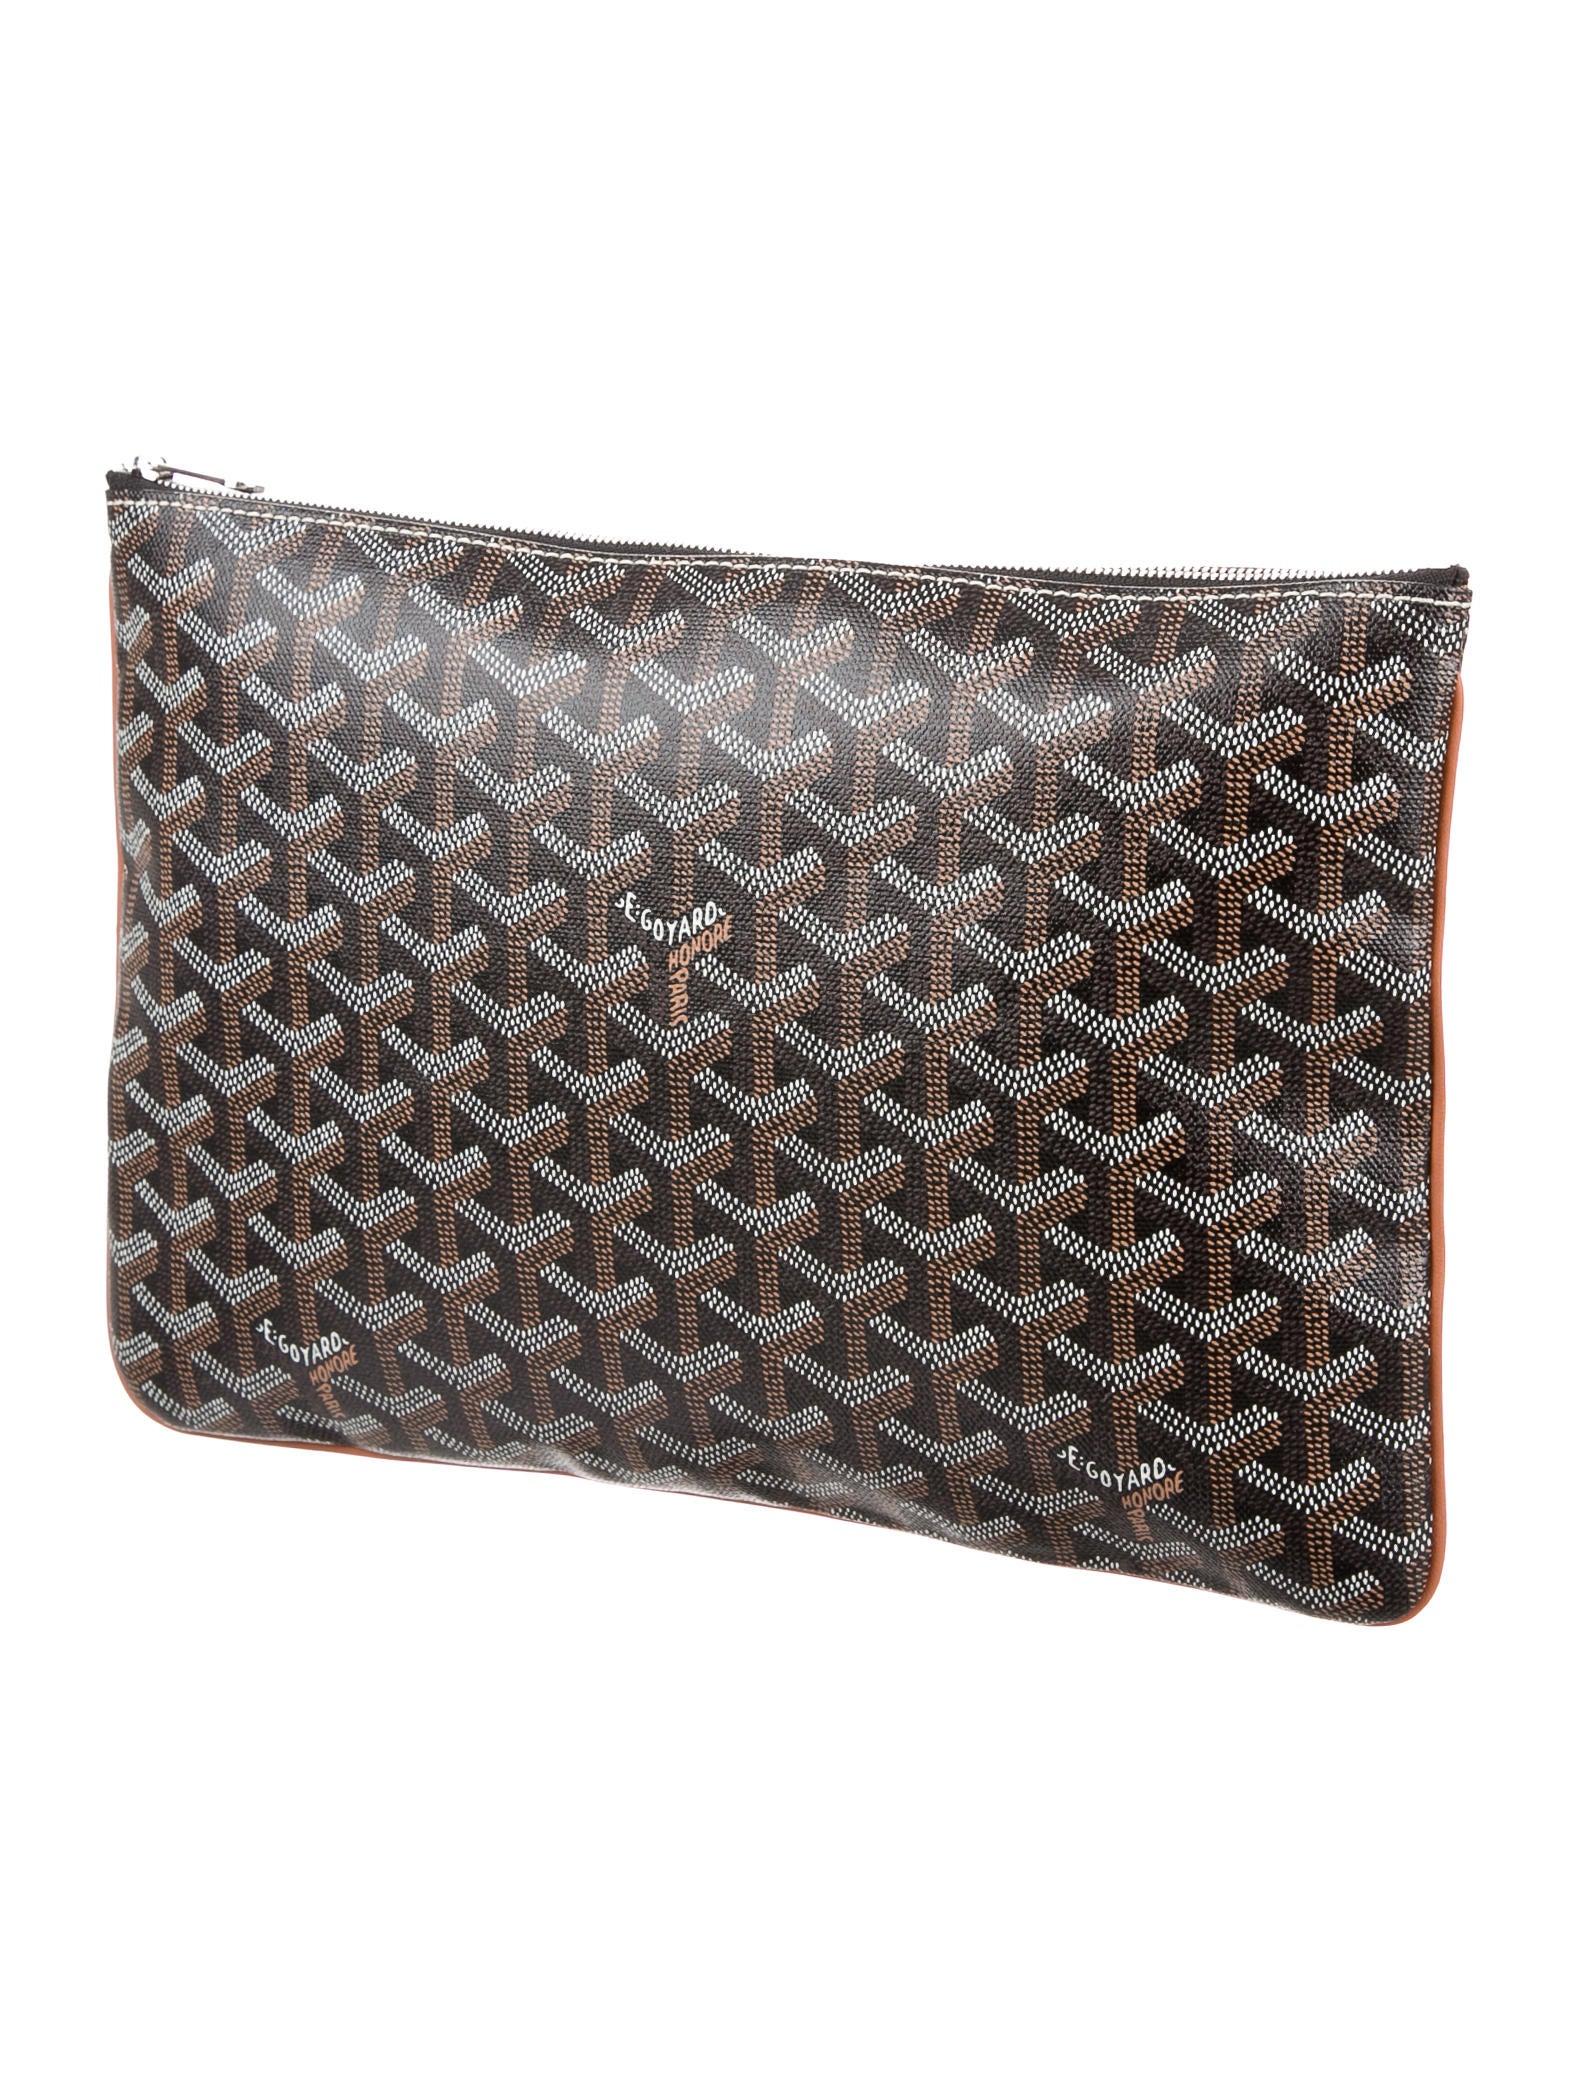 Goyard 2016 Goyardine Zip Pouch Bags Goy21502 The